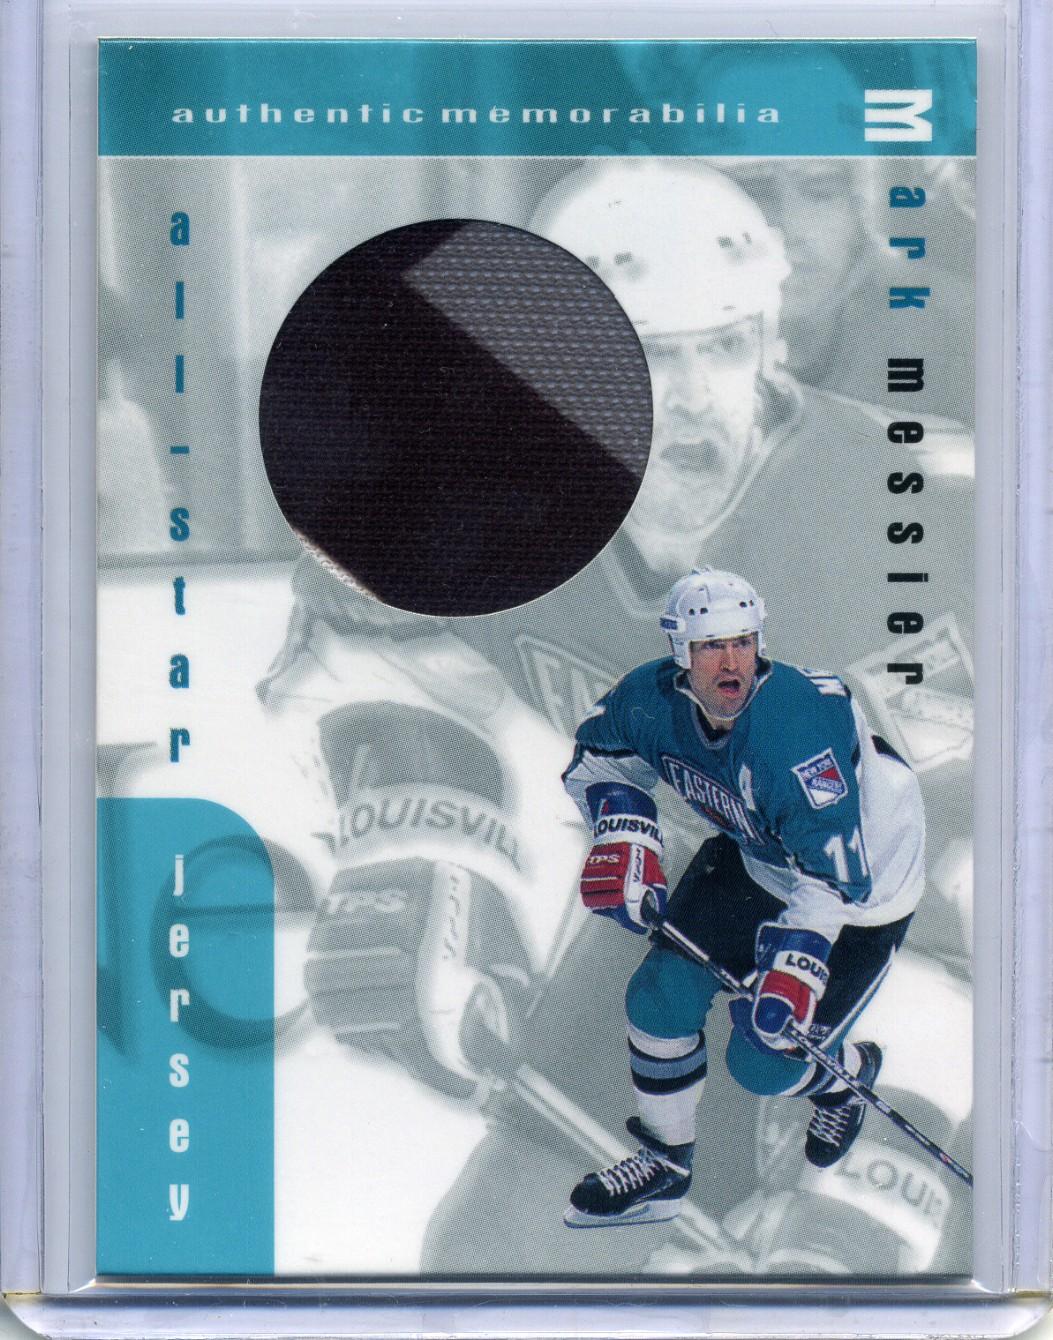 1999-00 BAP Memorabilia Jersey #J10 Mark Messier